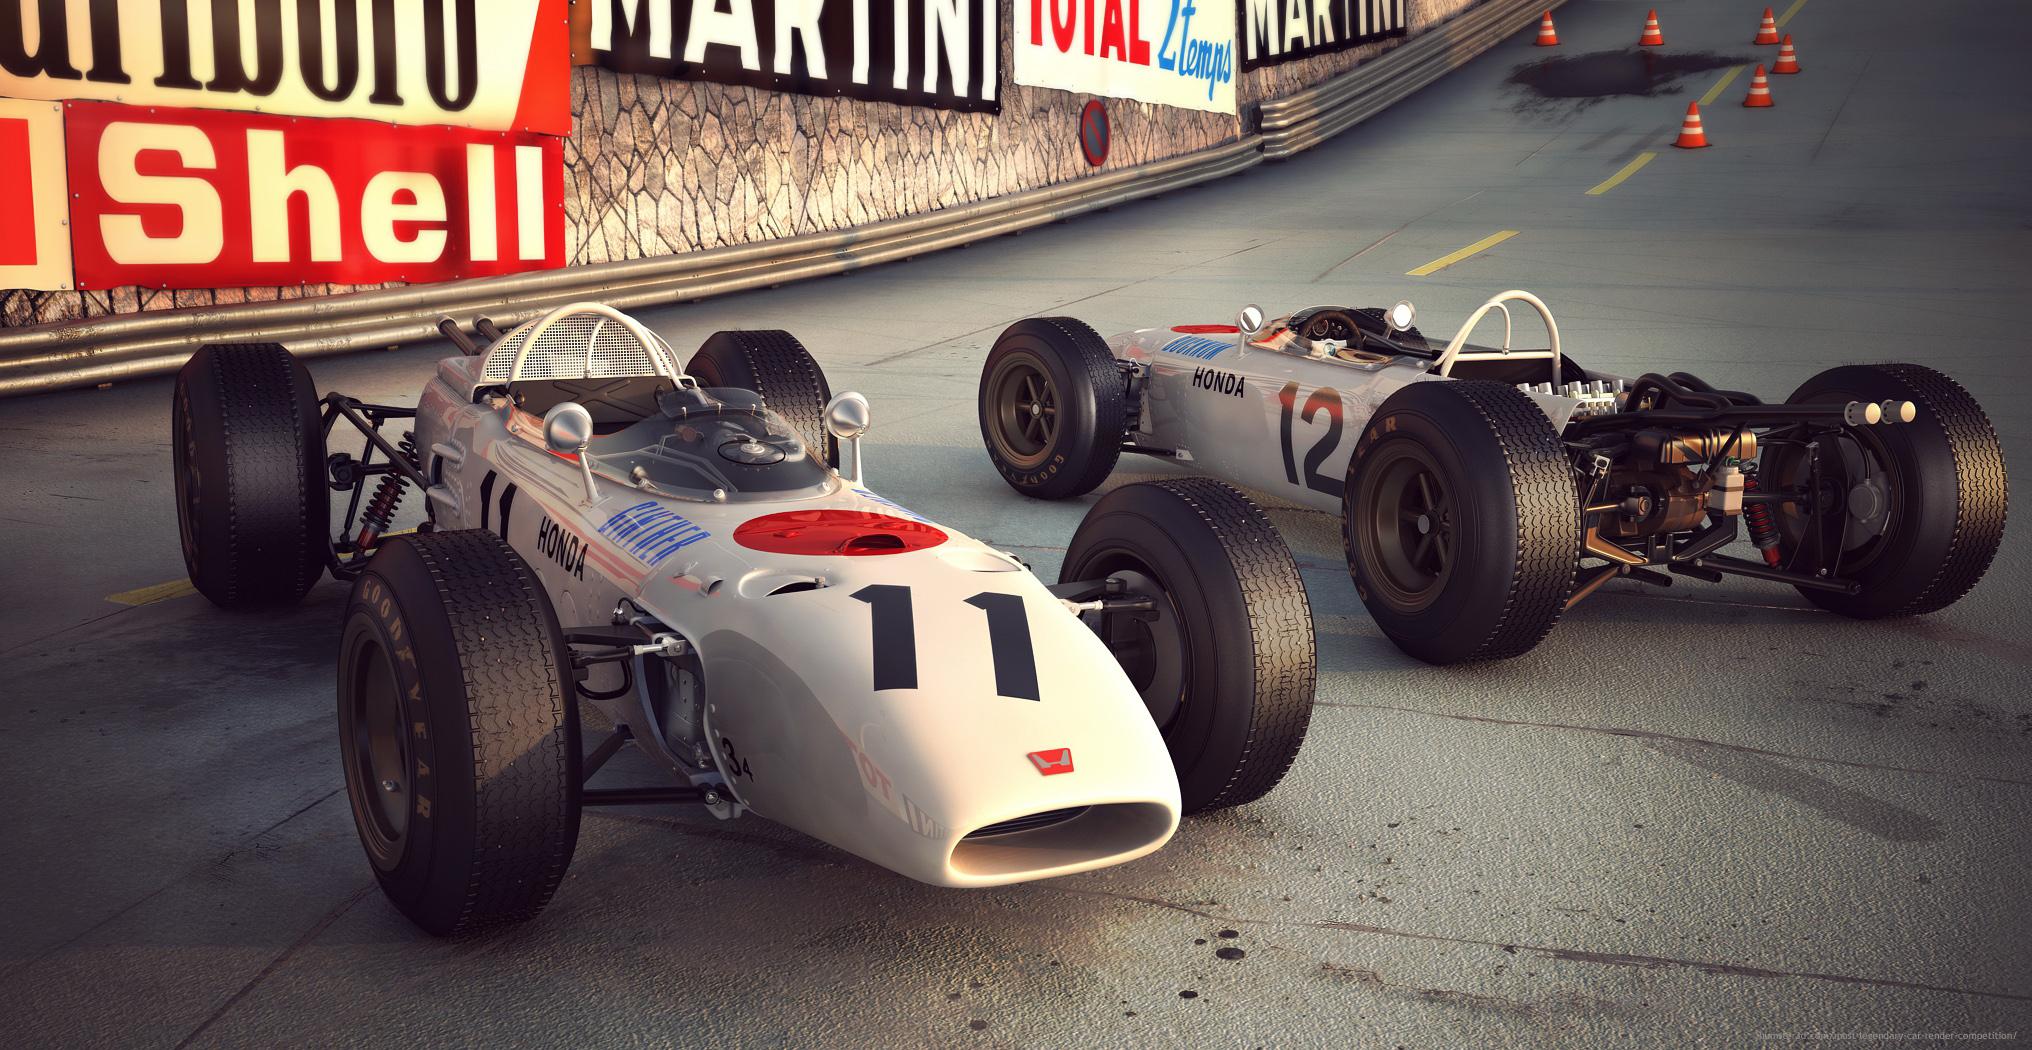 Hondas first Formula One race car won in 1965